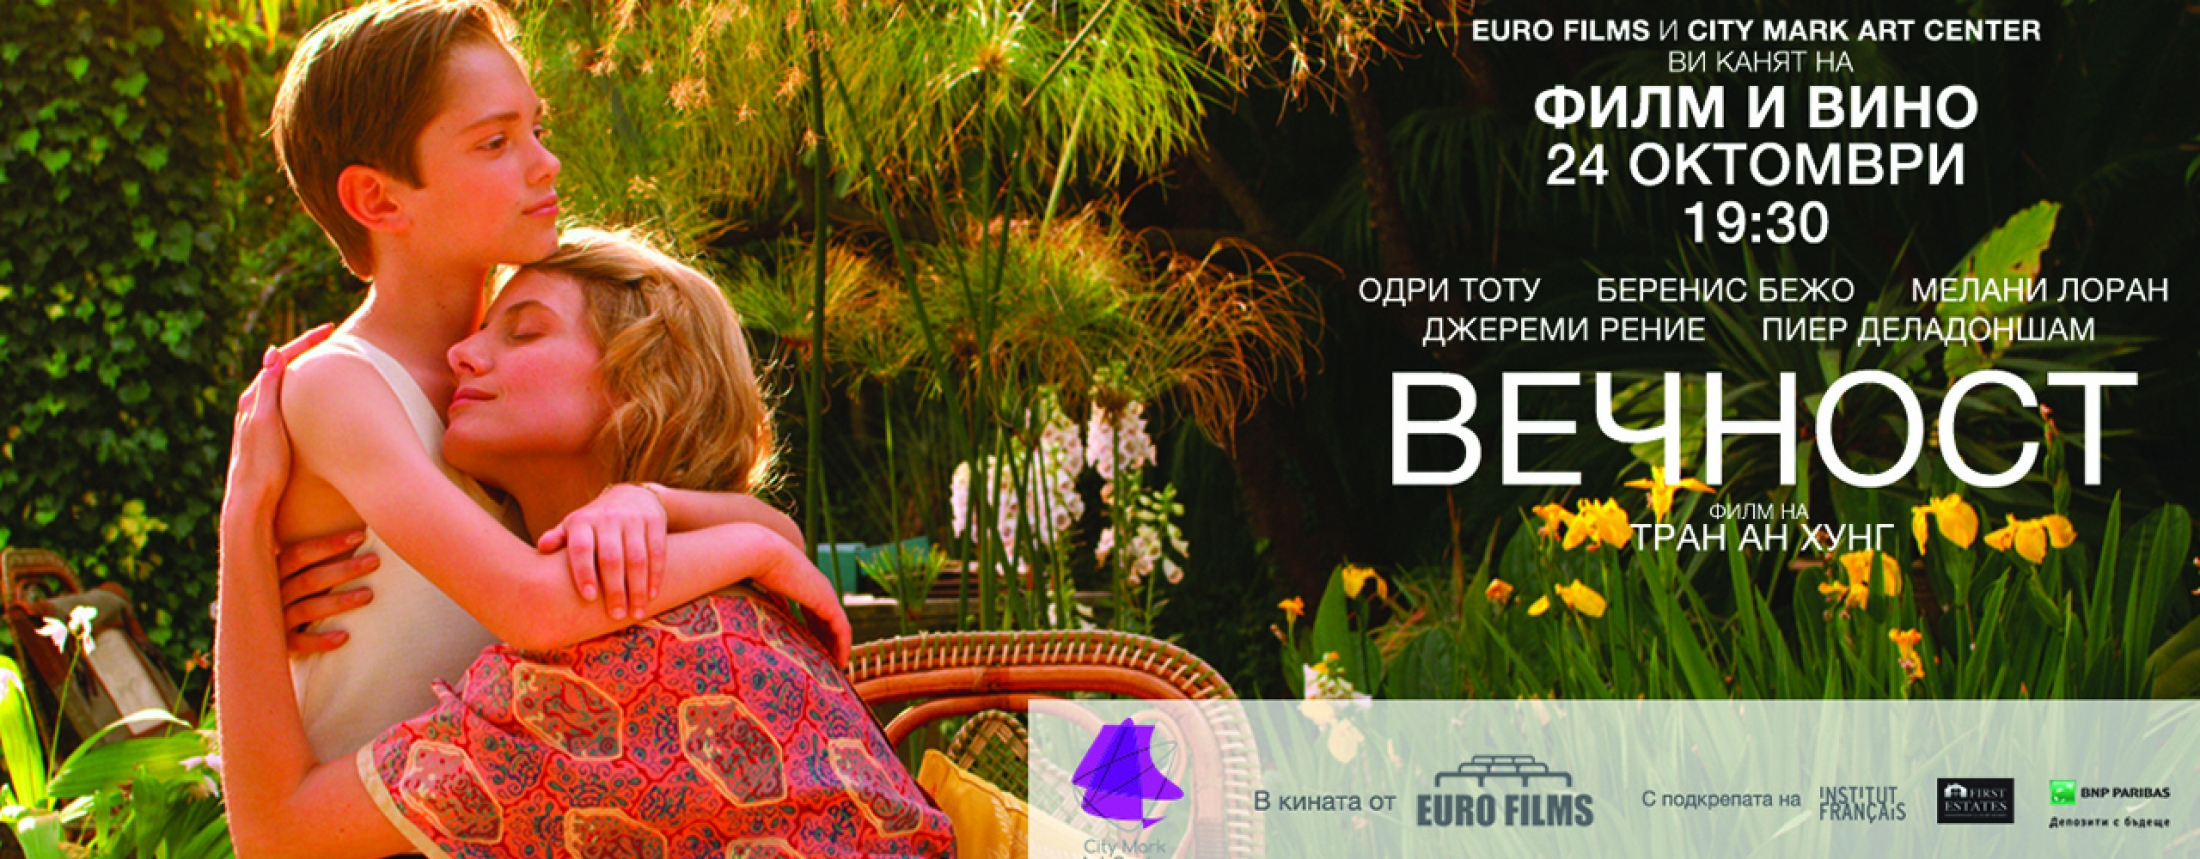 """Вечност"" с First Estates и Euro Films"